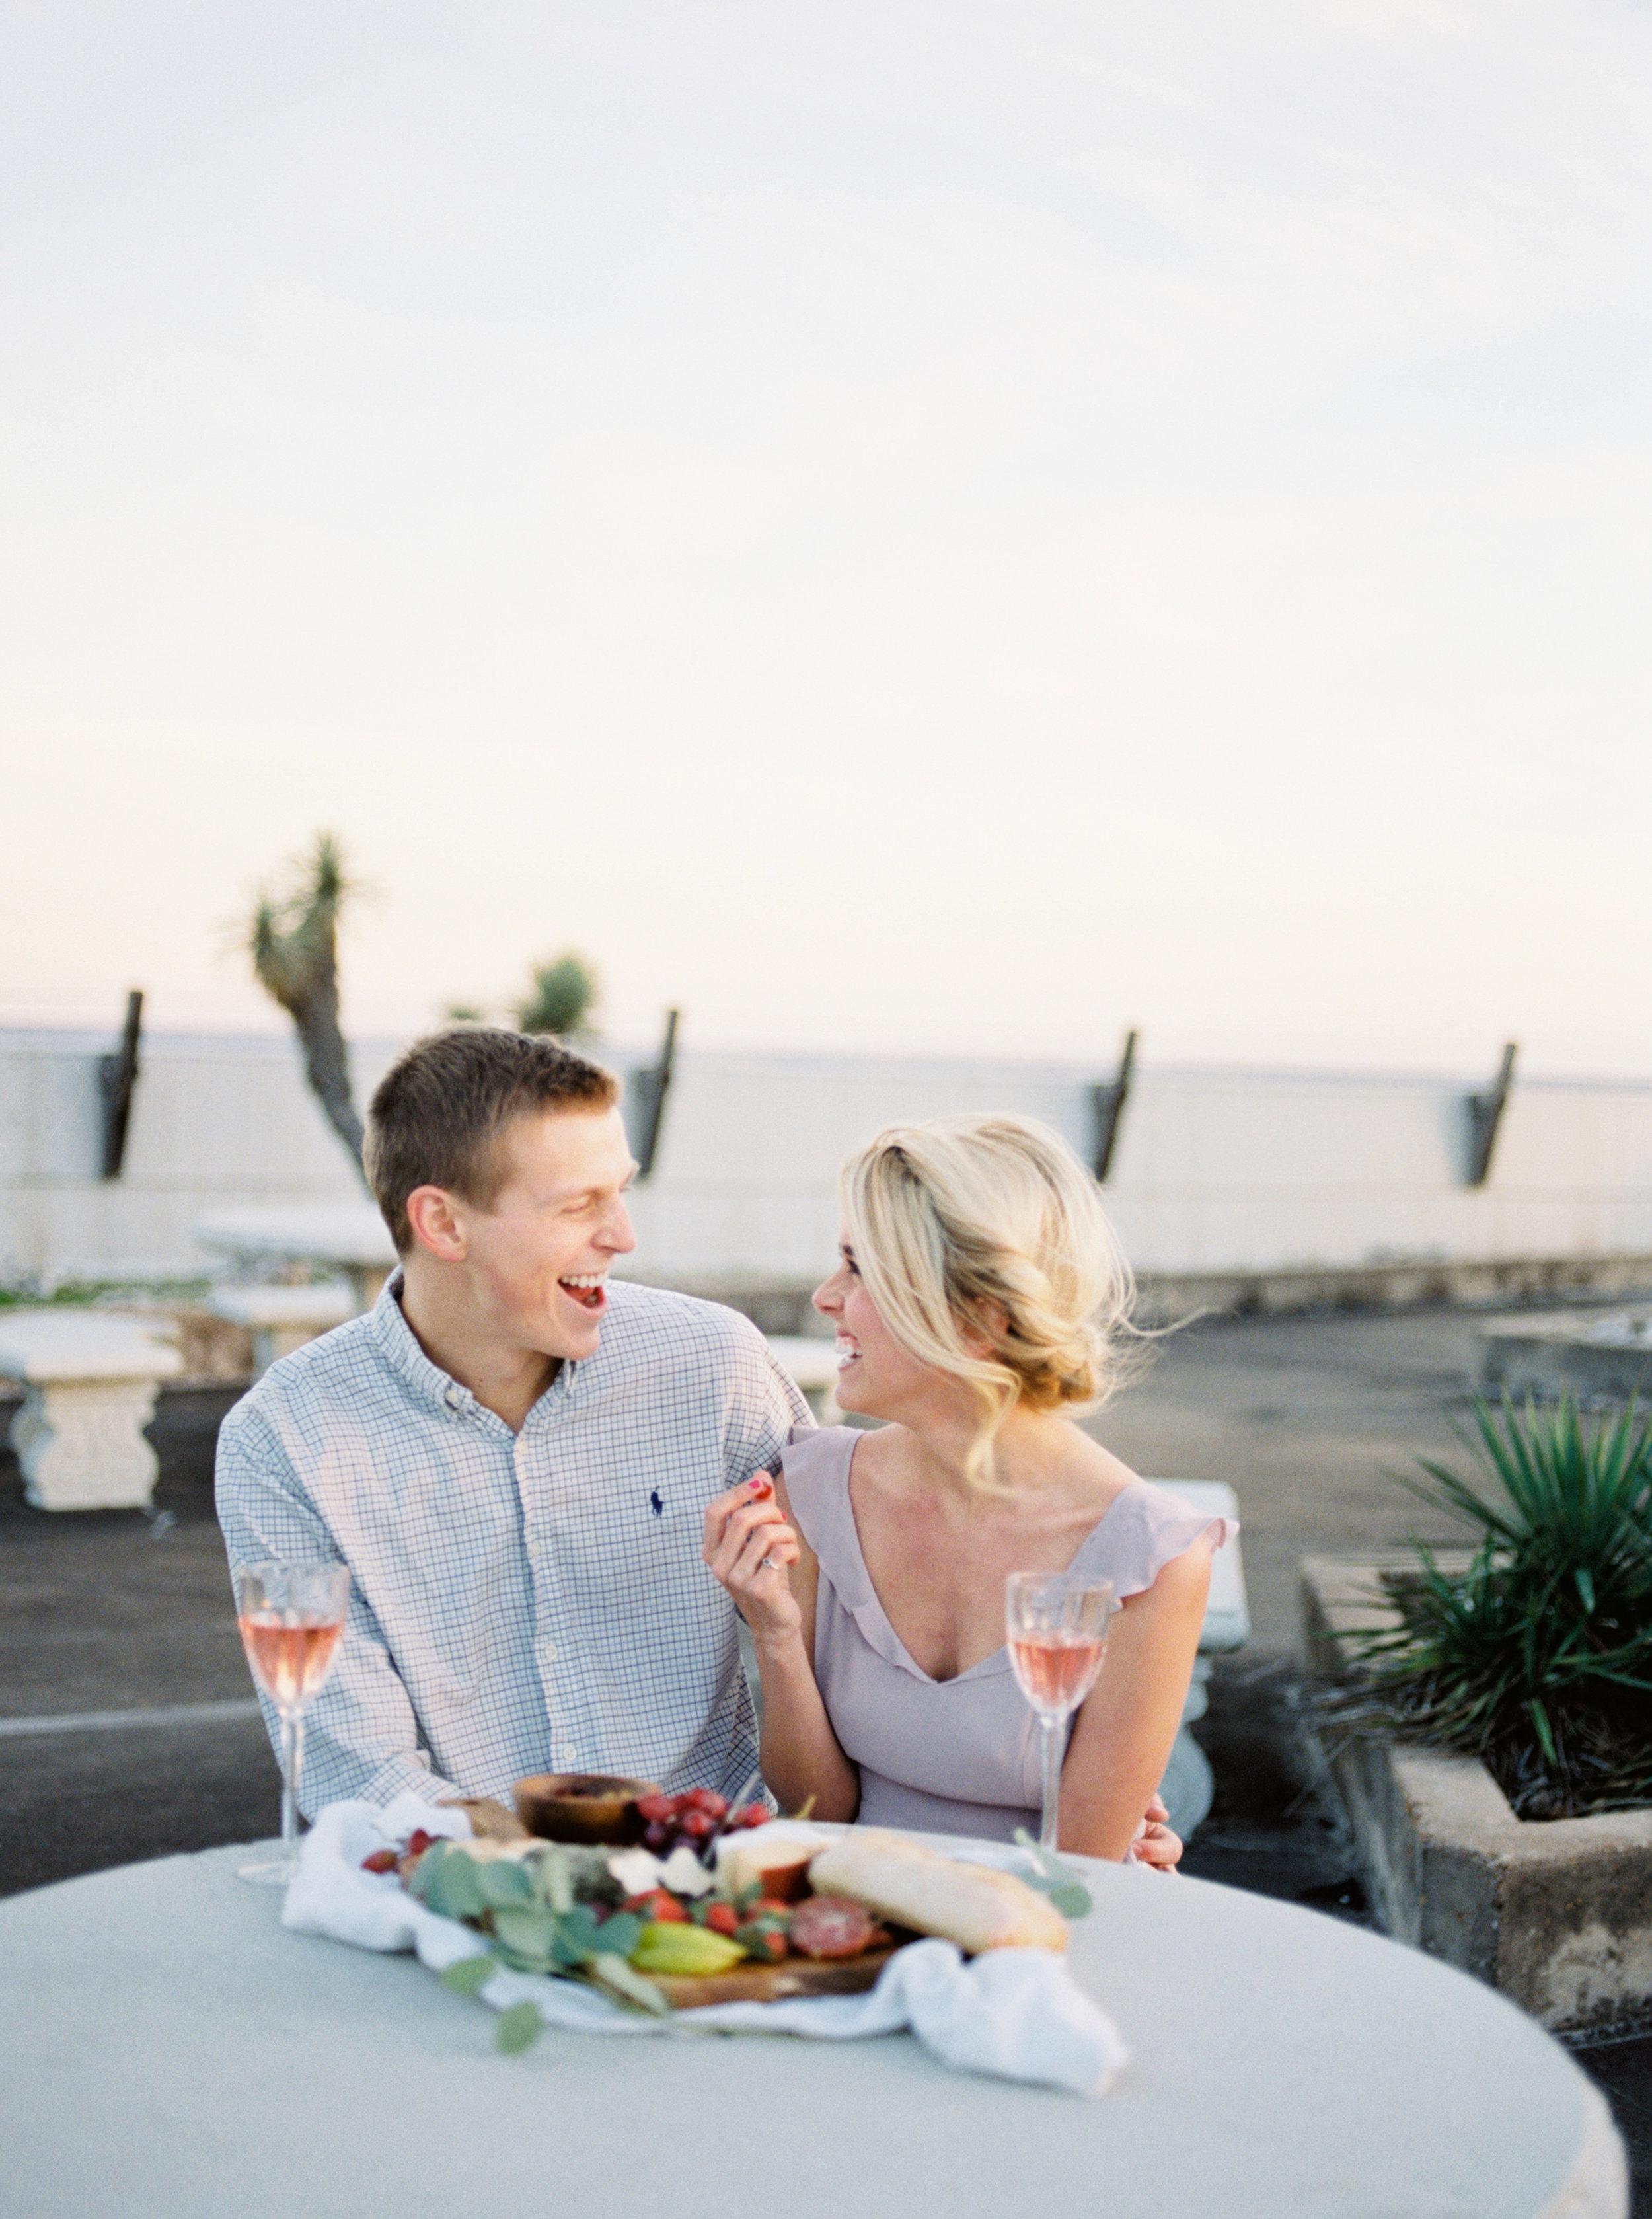 Austin Texas Fine Art Documentary Wedding Photographer -16.jpg